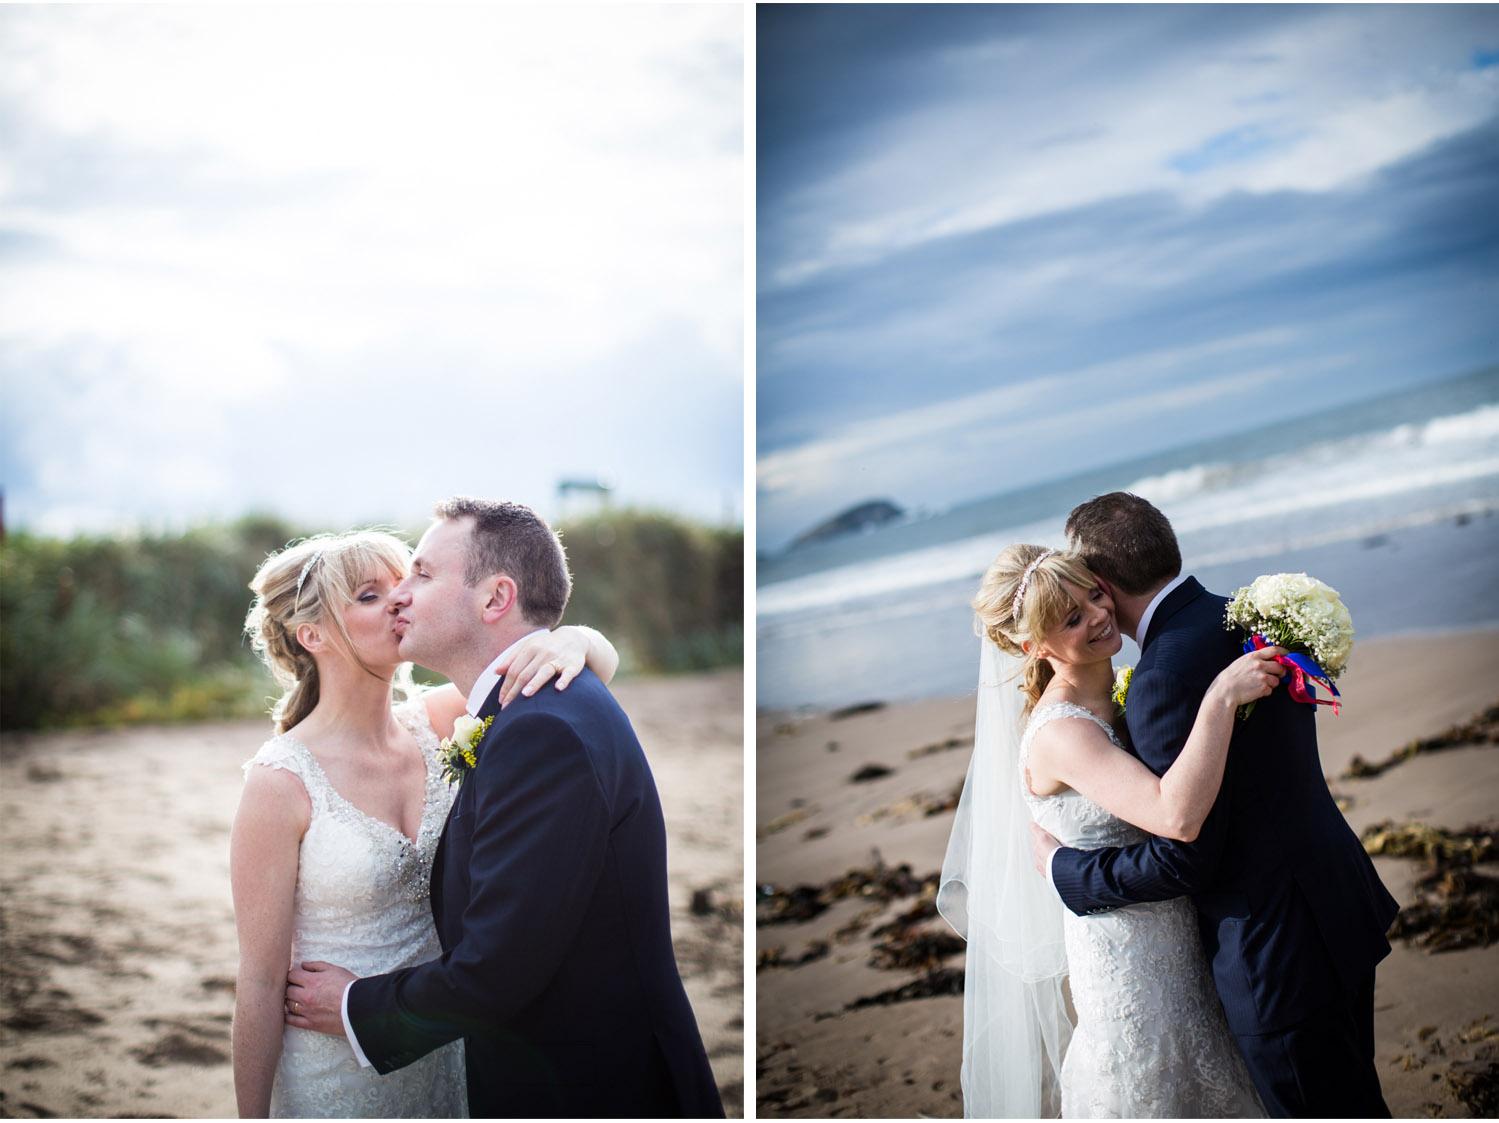 Abigail and Declan's wedding-12.jpg